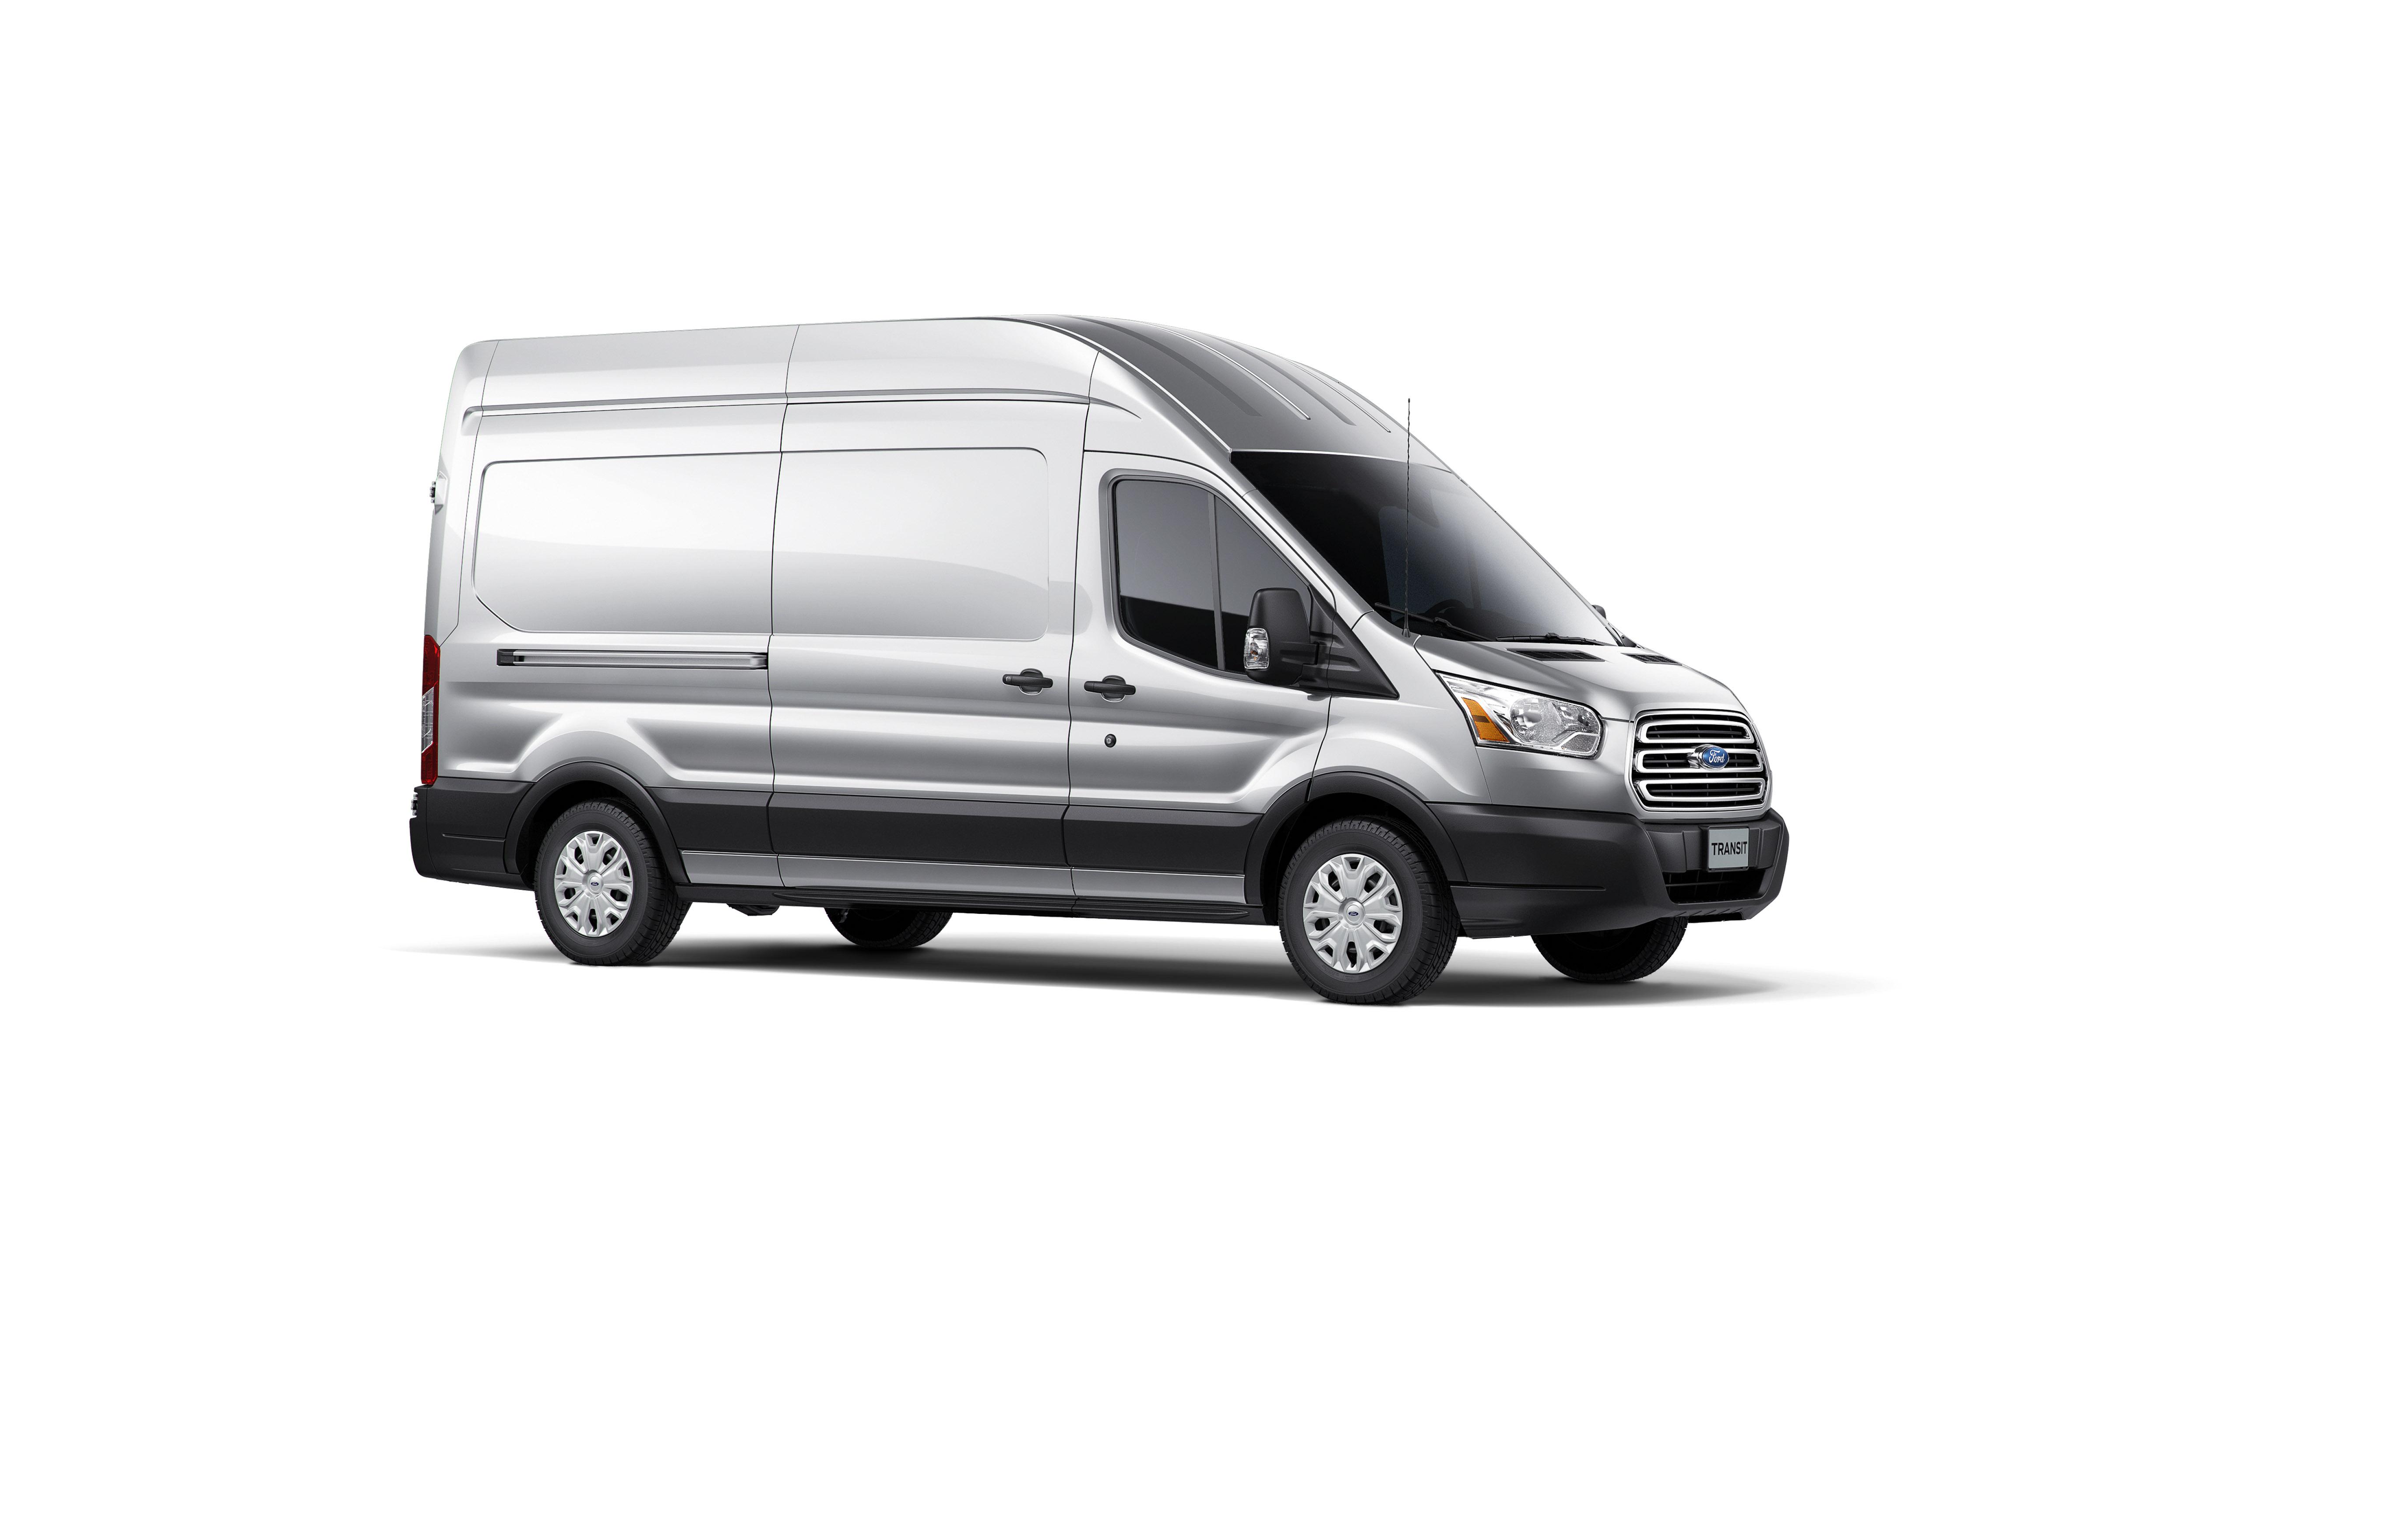 2015 Ford Transit Full-Size Van